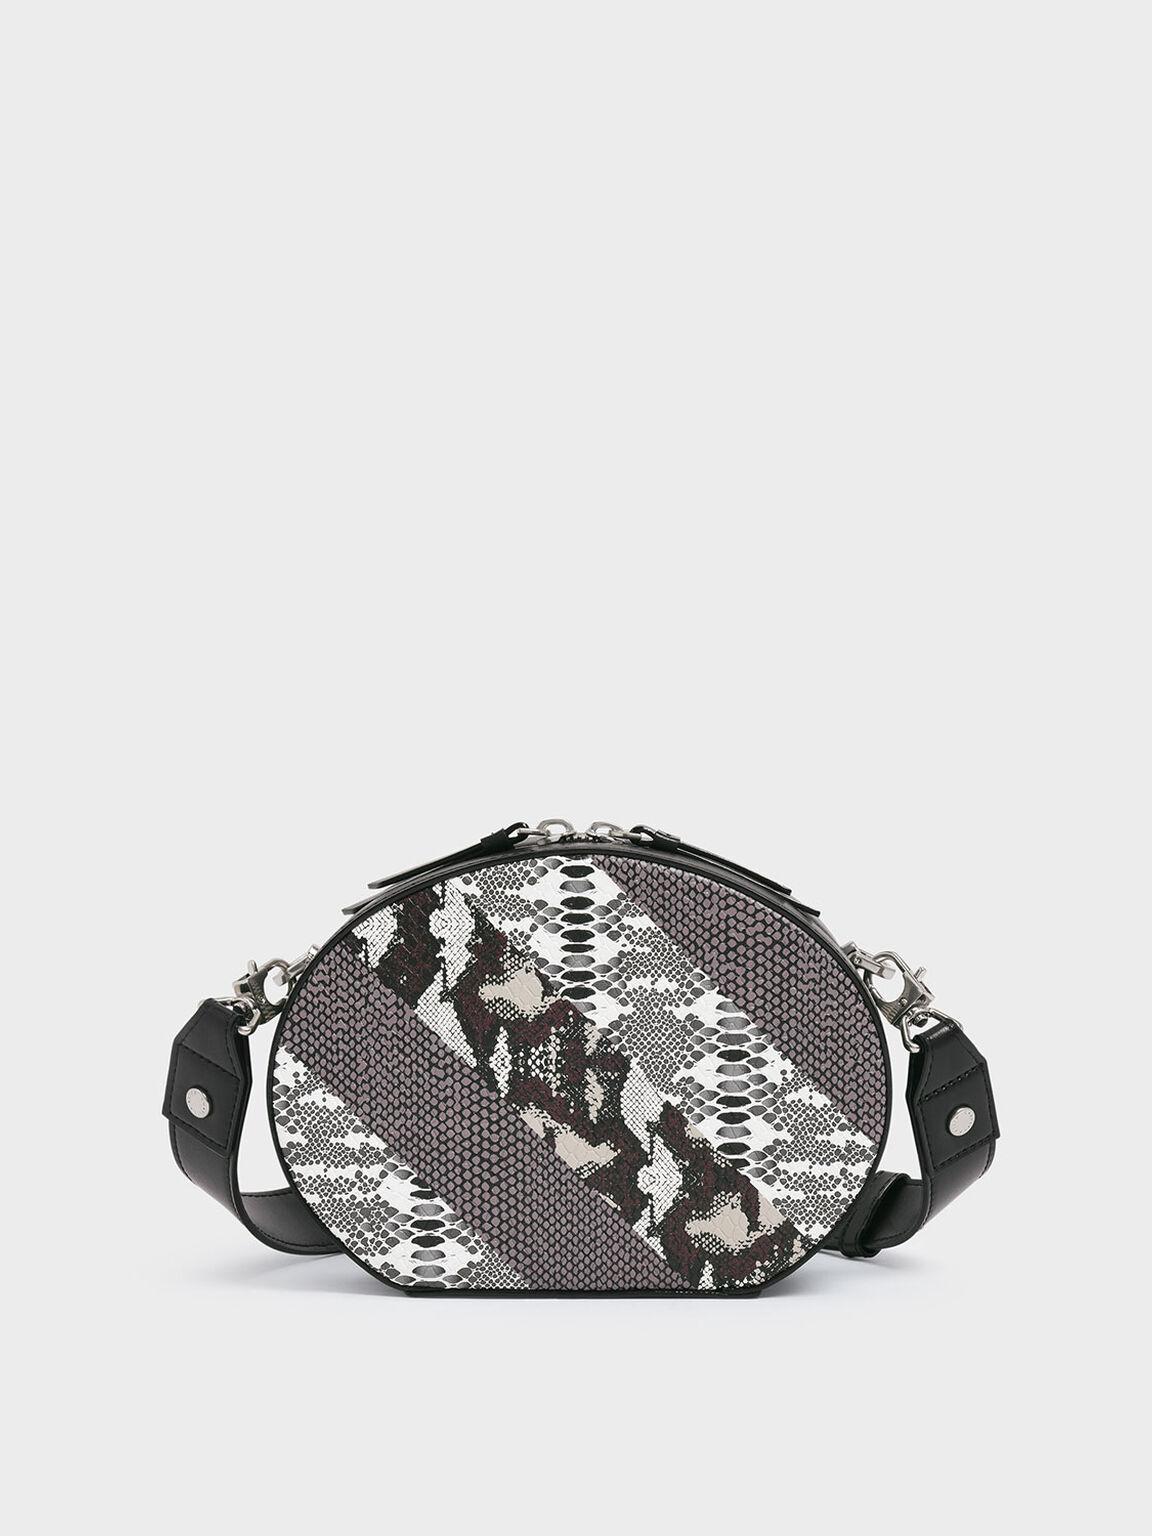 Snake Print Oval Crossbody Bag, Multi, hi-res